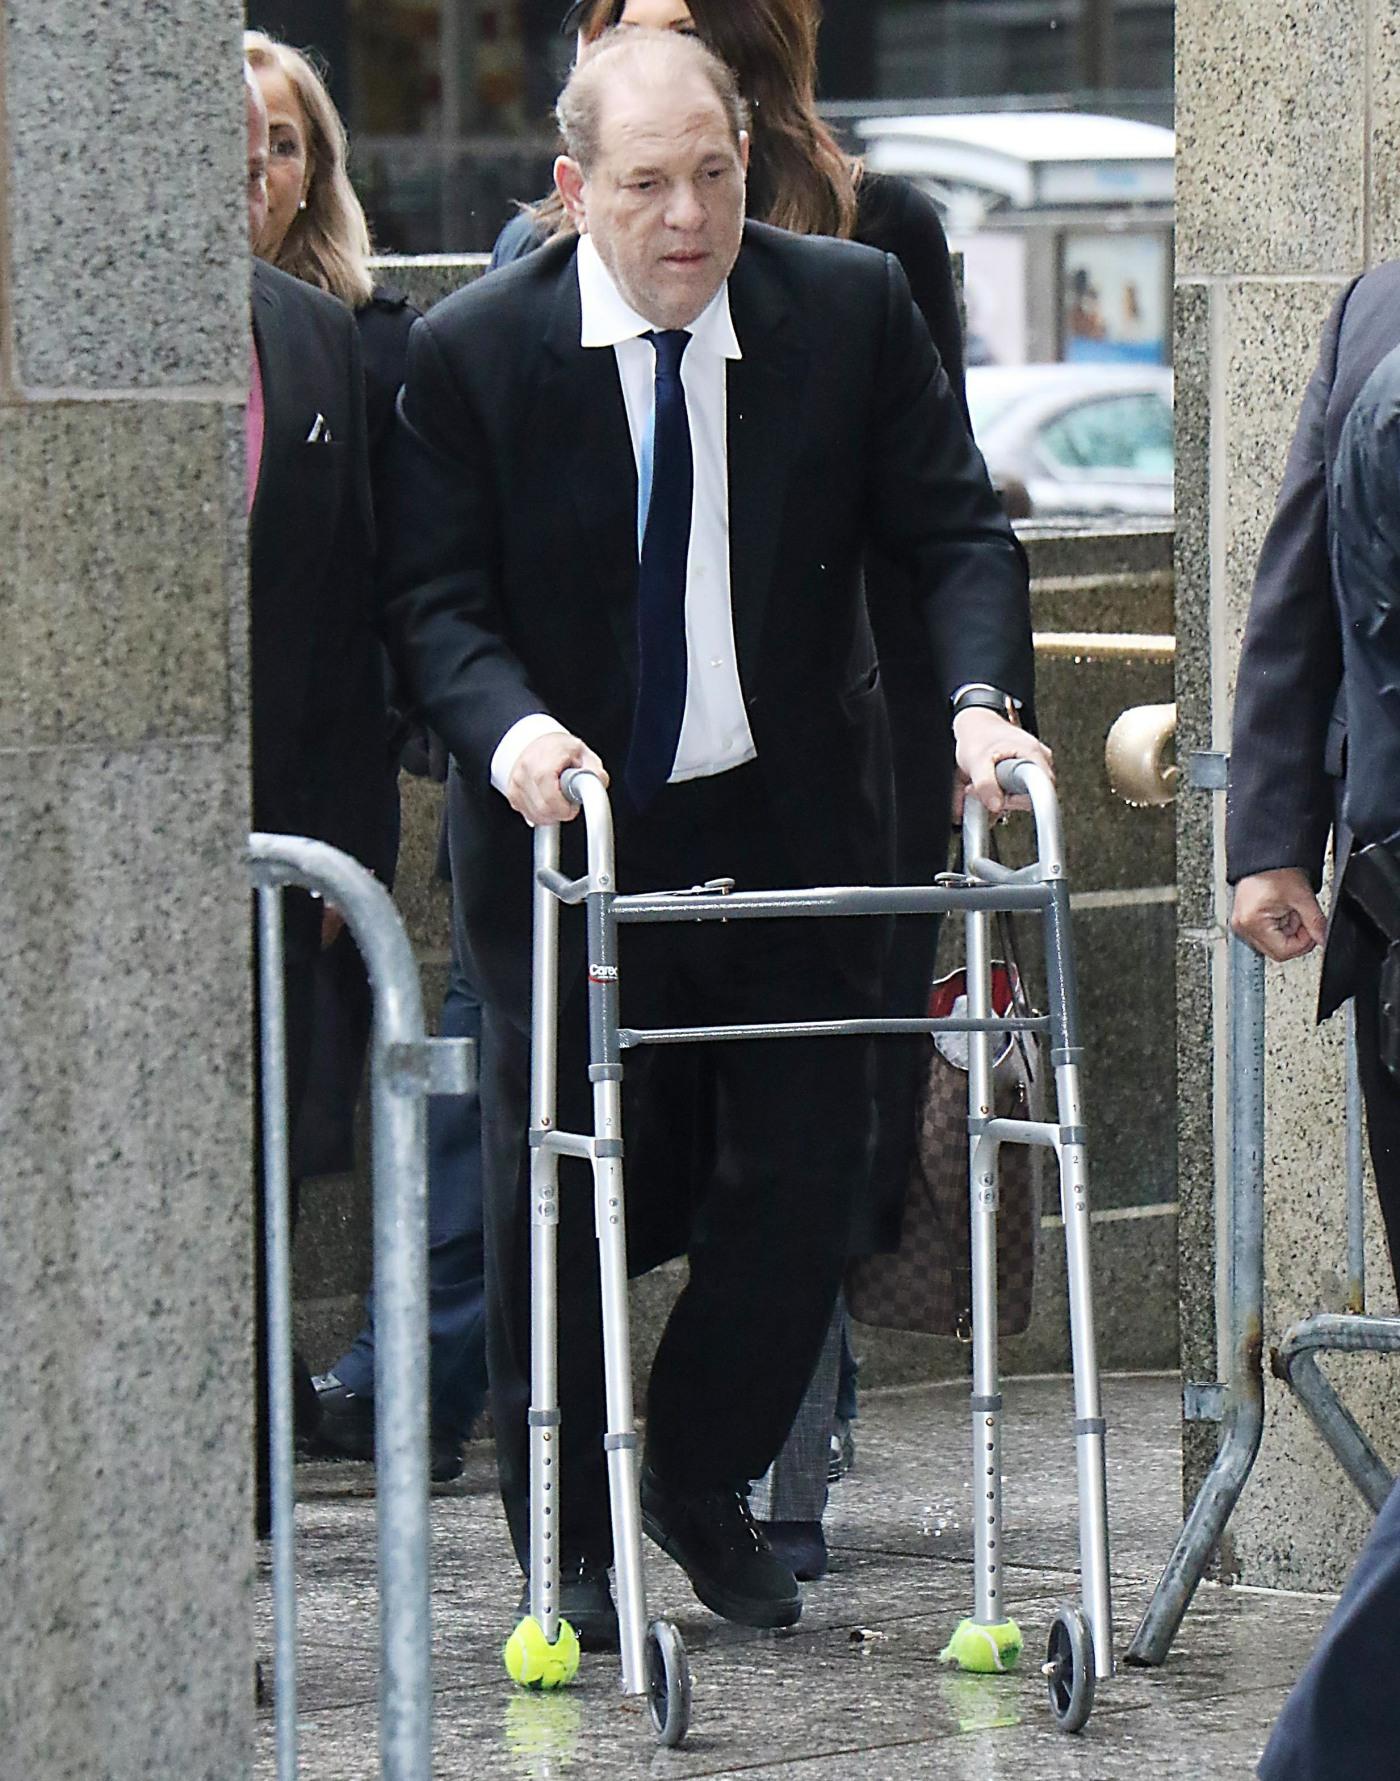 Harvey Weinstein posts new bond to ensure he won't flee sexual assault trial